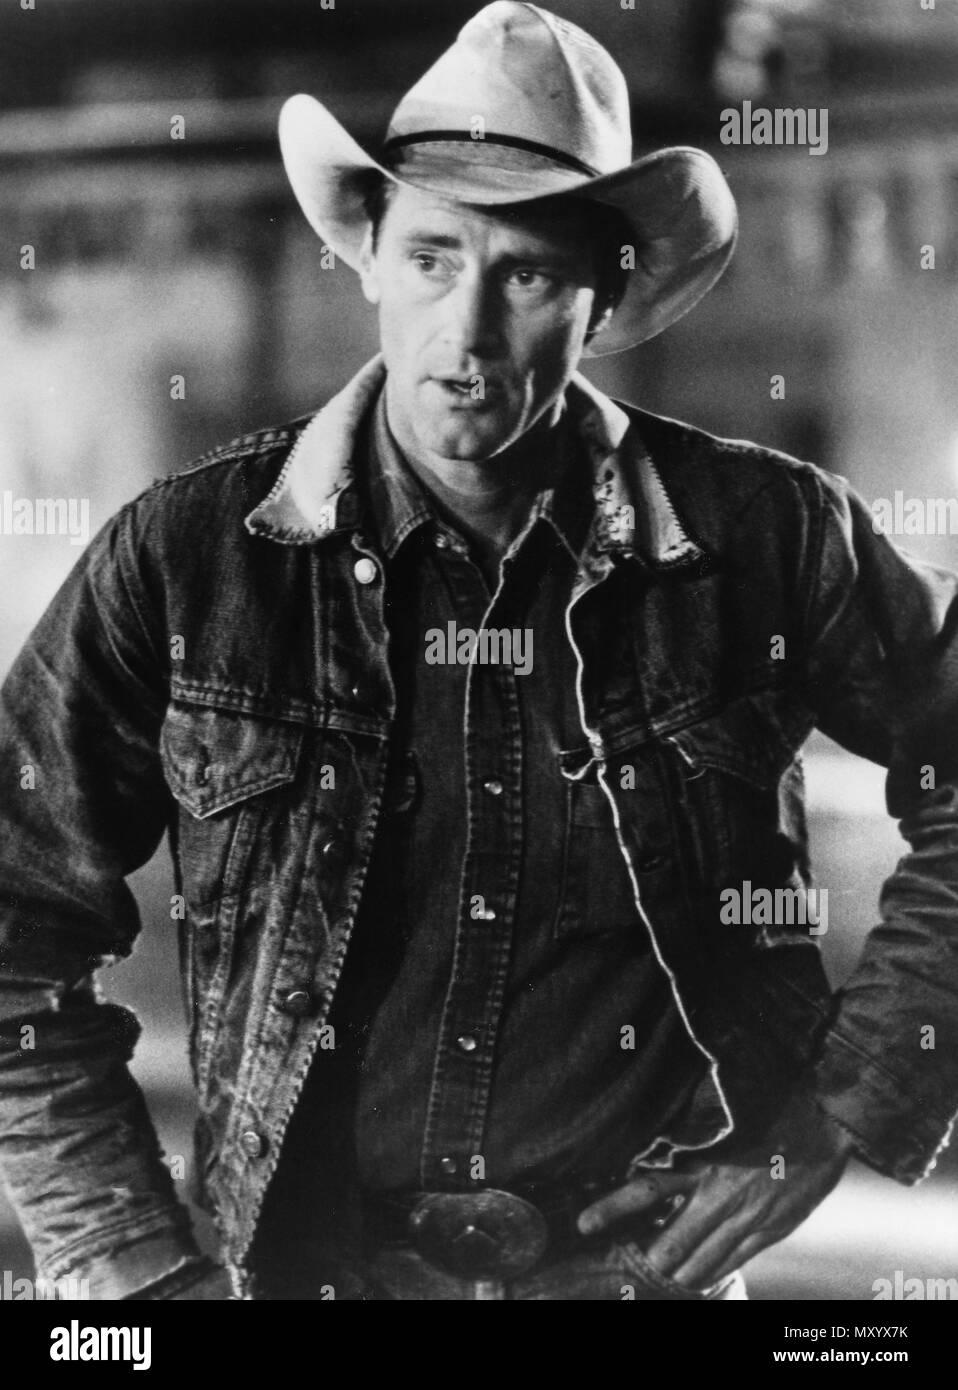 sam shepard, fool for love, 1985 - Stock Image